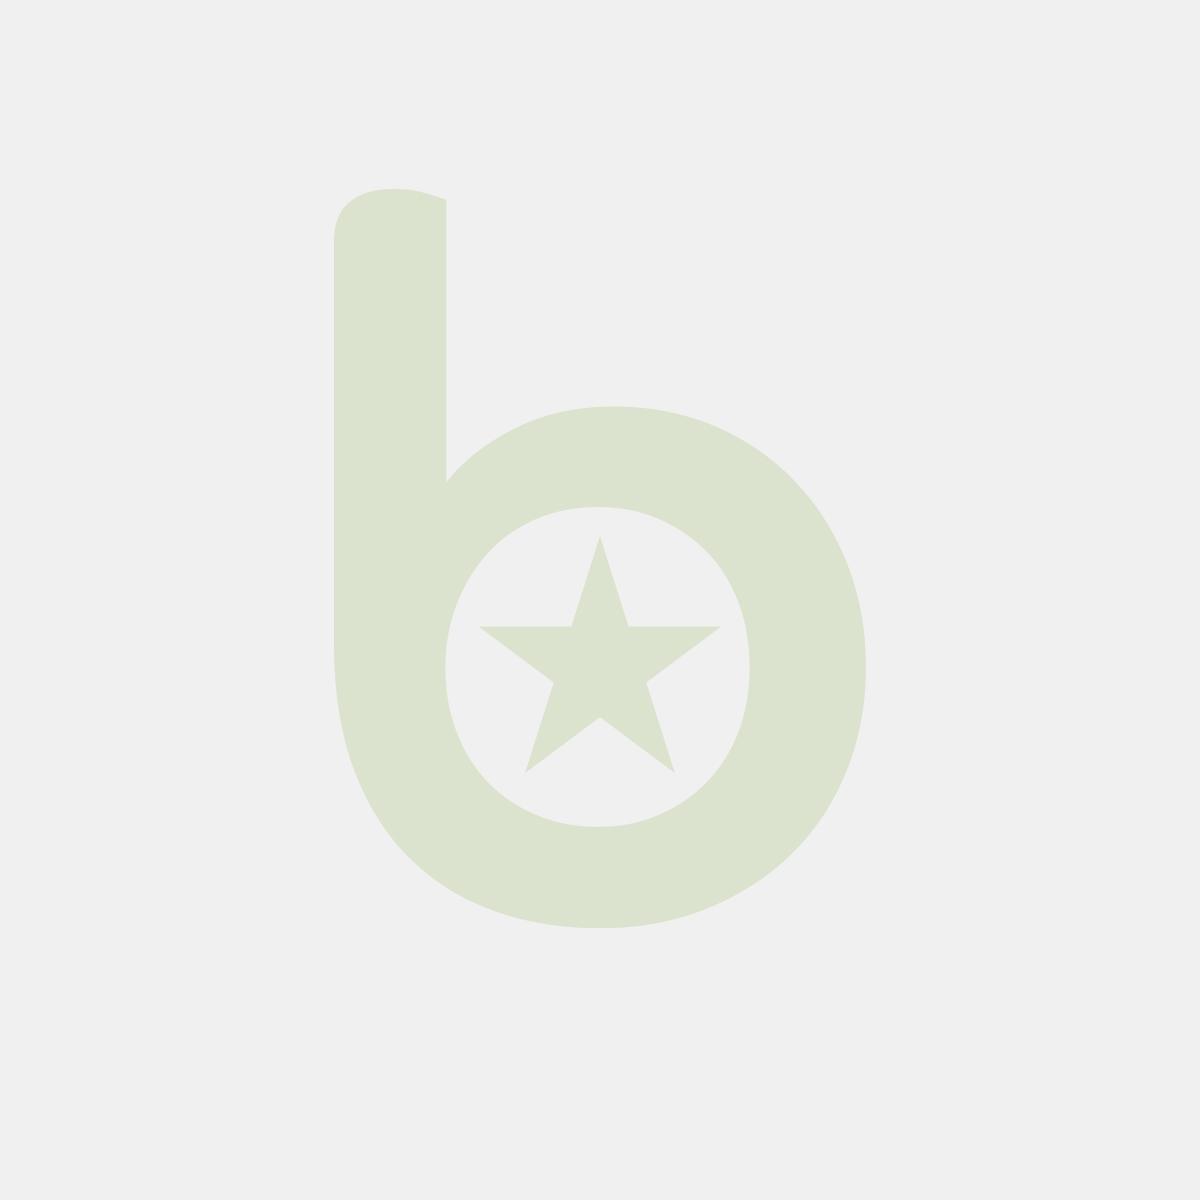 FINGERFOOD talerzyk na mini przekąski 6 x 6 cm op. 30 sztuk